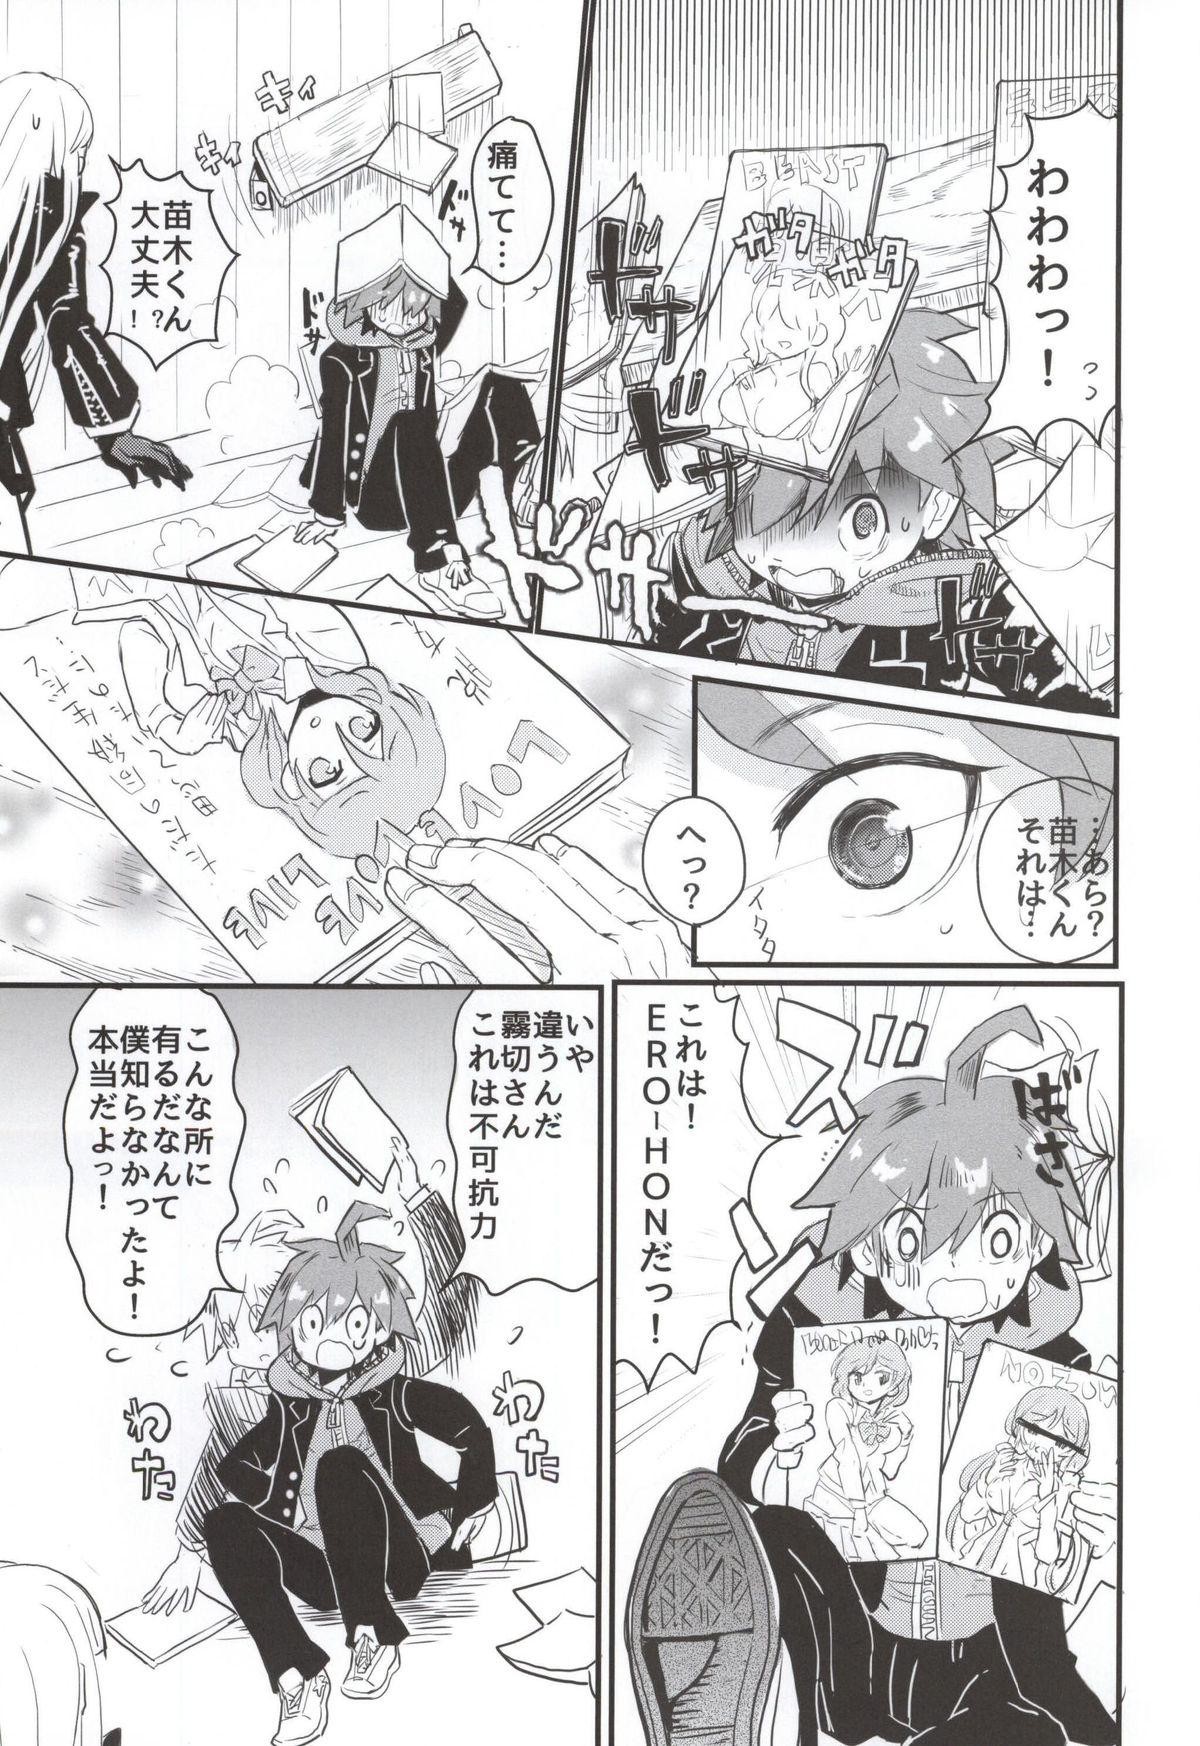 Kirigiri-san to Issho ni School Mode 7